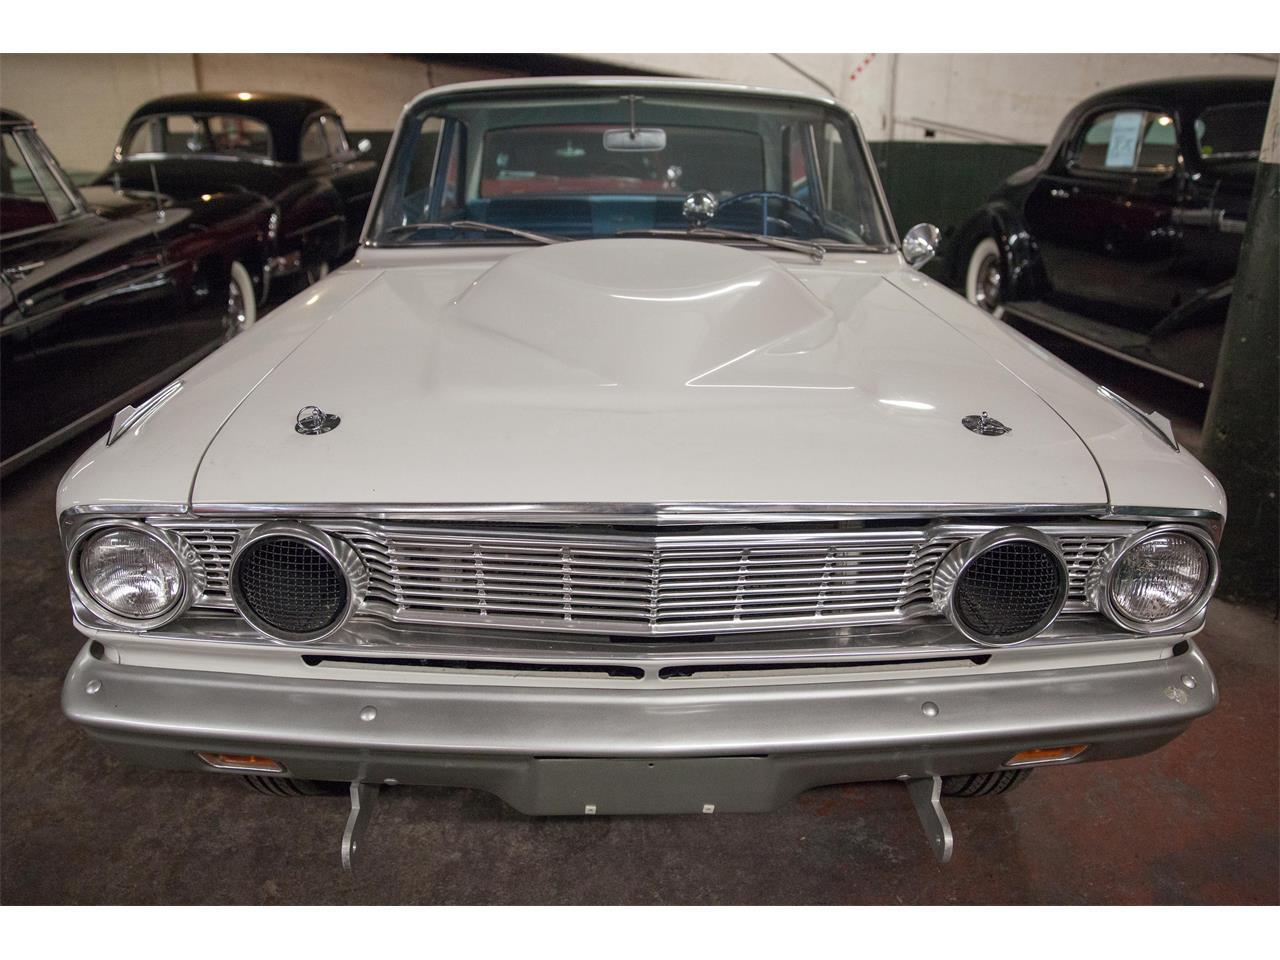 1964 Ford Fairlane Thunderbolt Clone in Pittsburgh, Pennsylvania